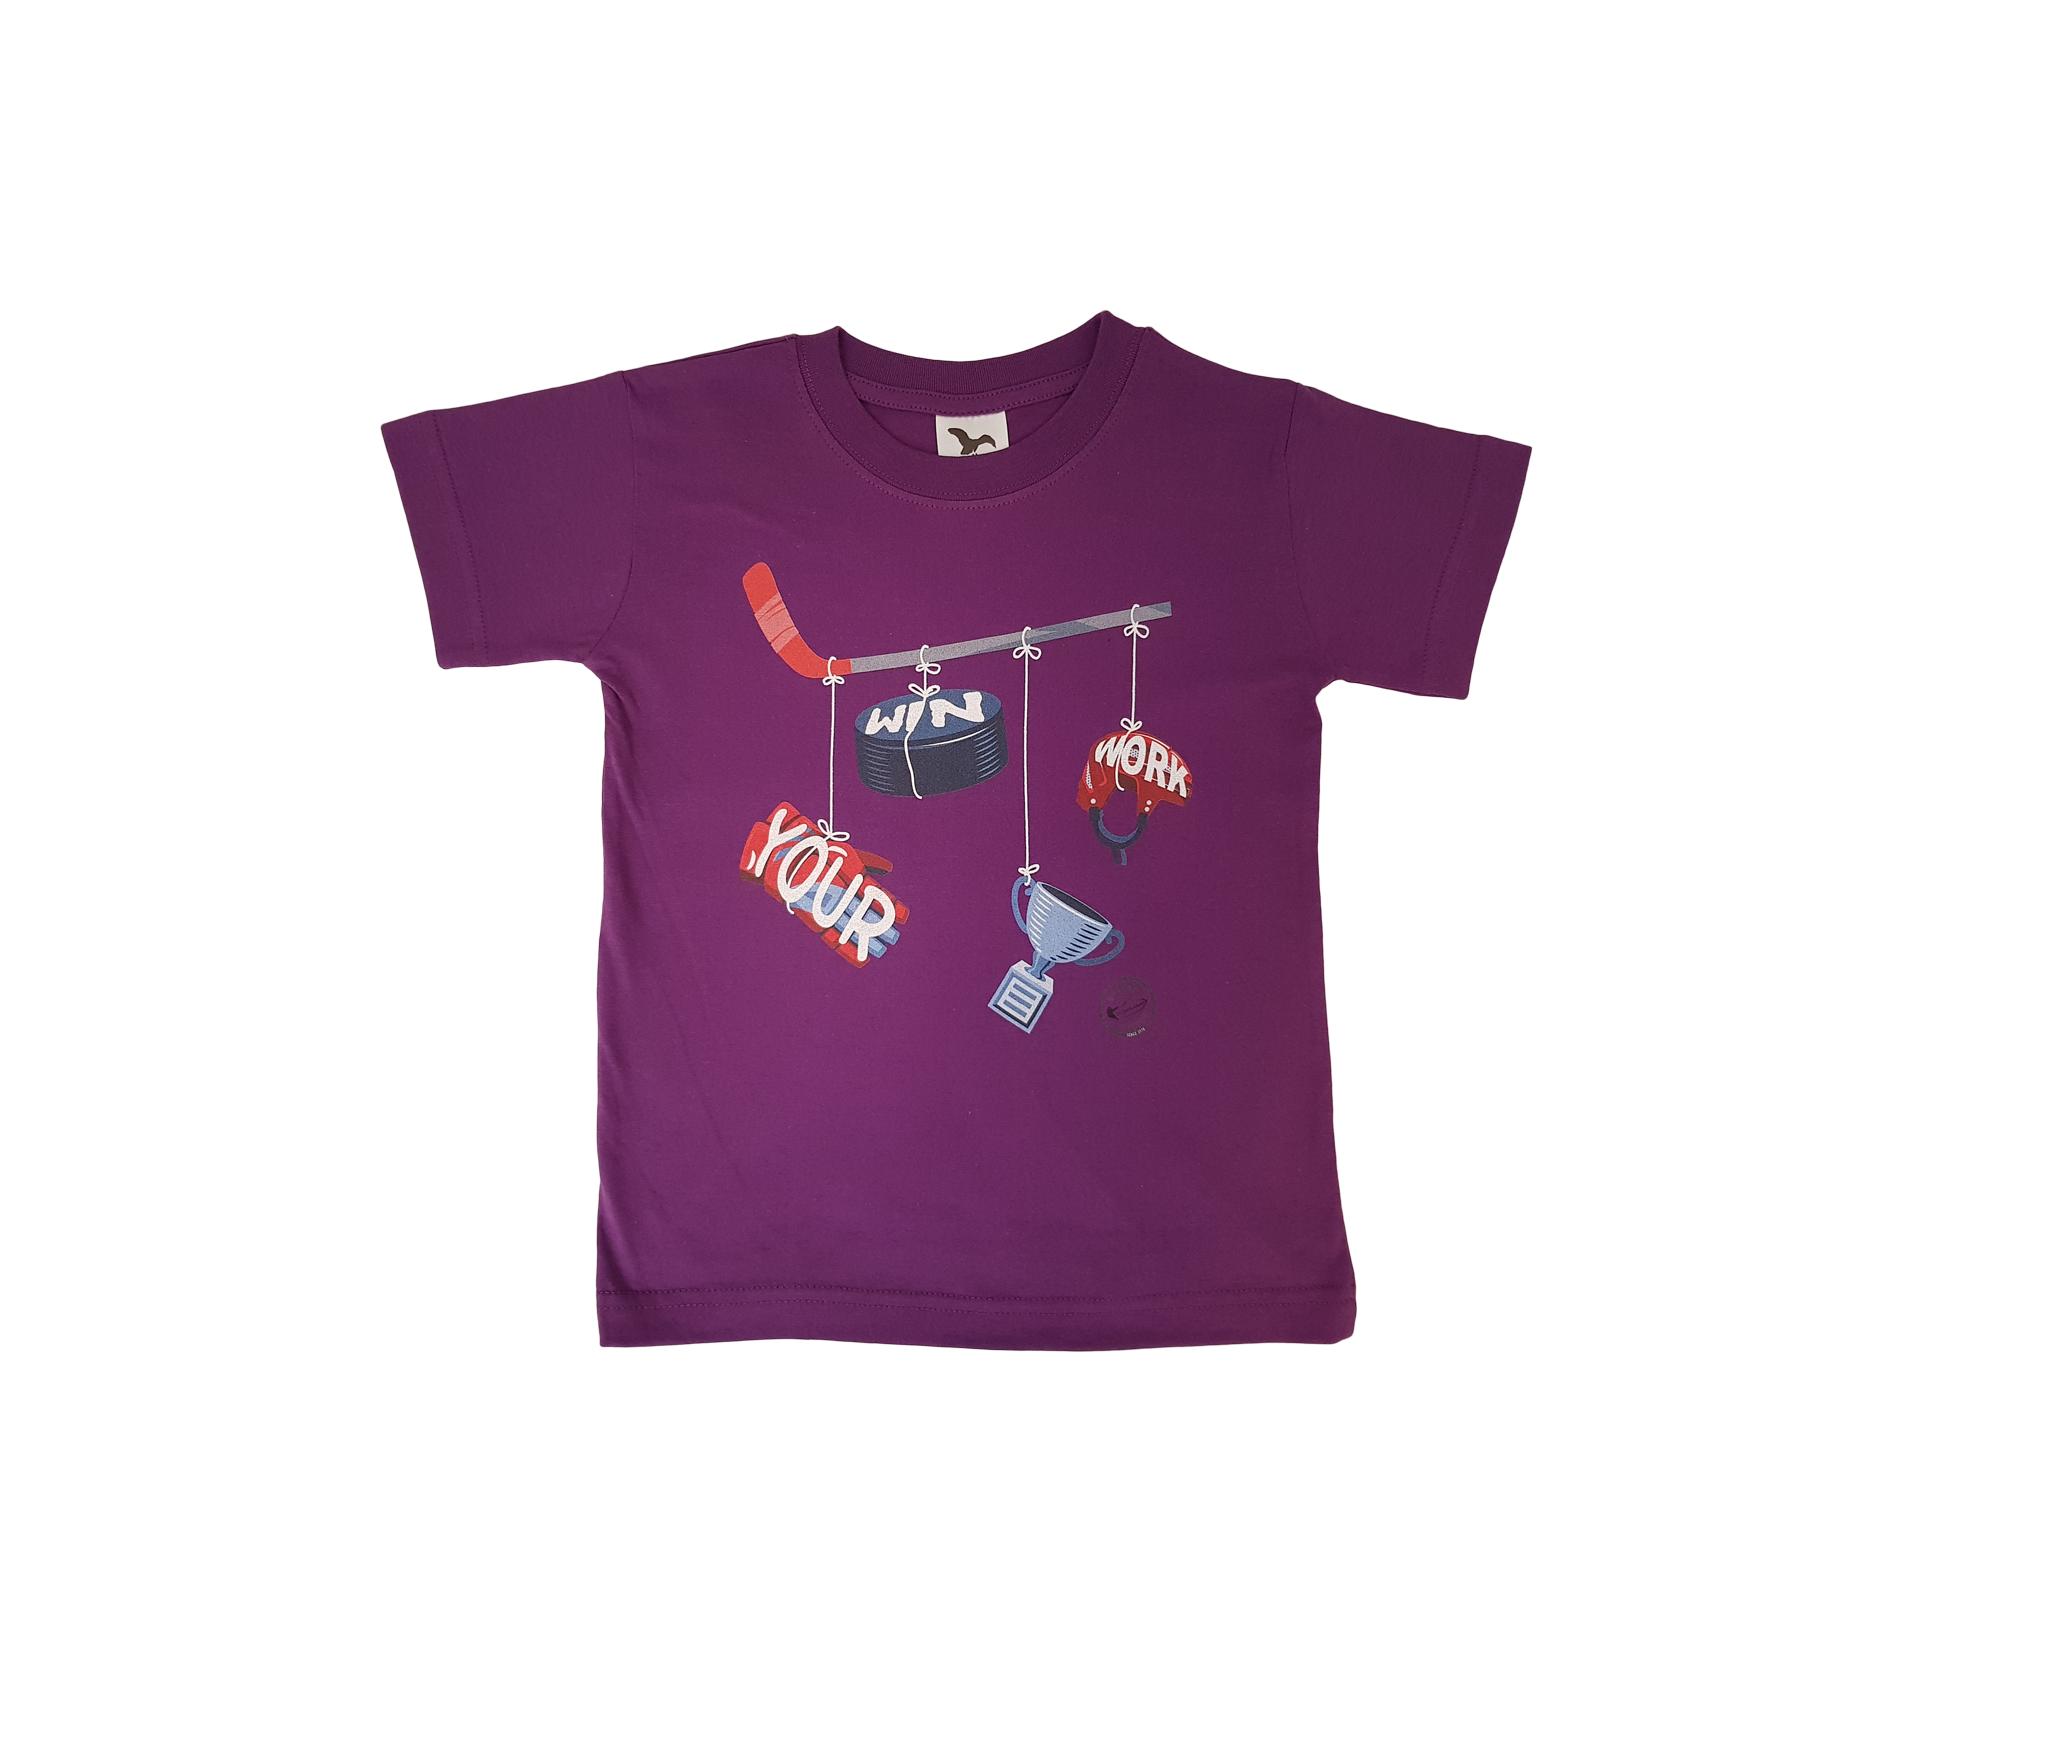 HOKEJAM.LV Your Win Work Youth T-Shirt